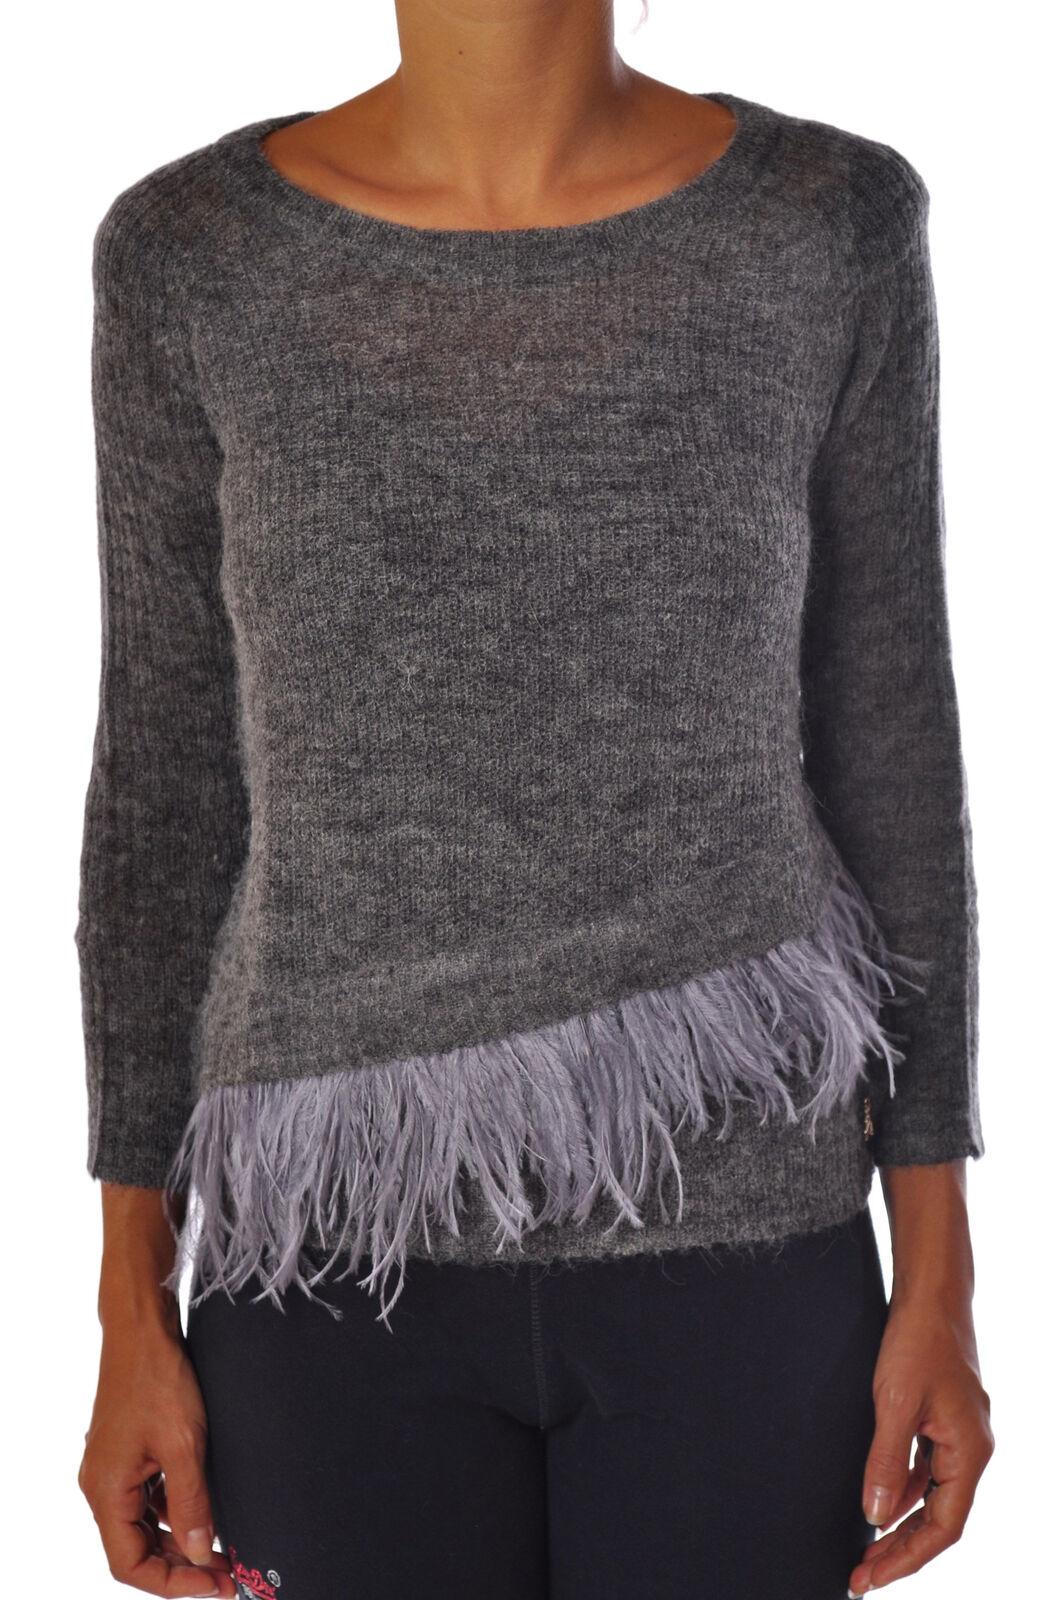 Patrizia Pepe - Knitwear-Sweaters - Woman - Grau - 961618C183533